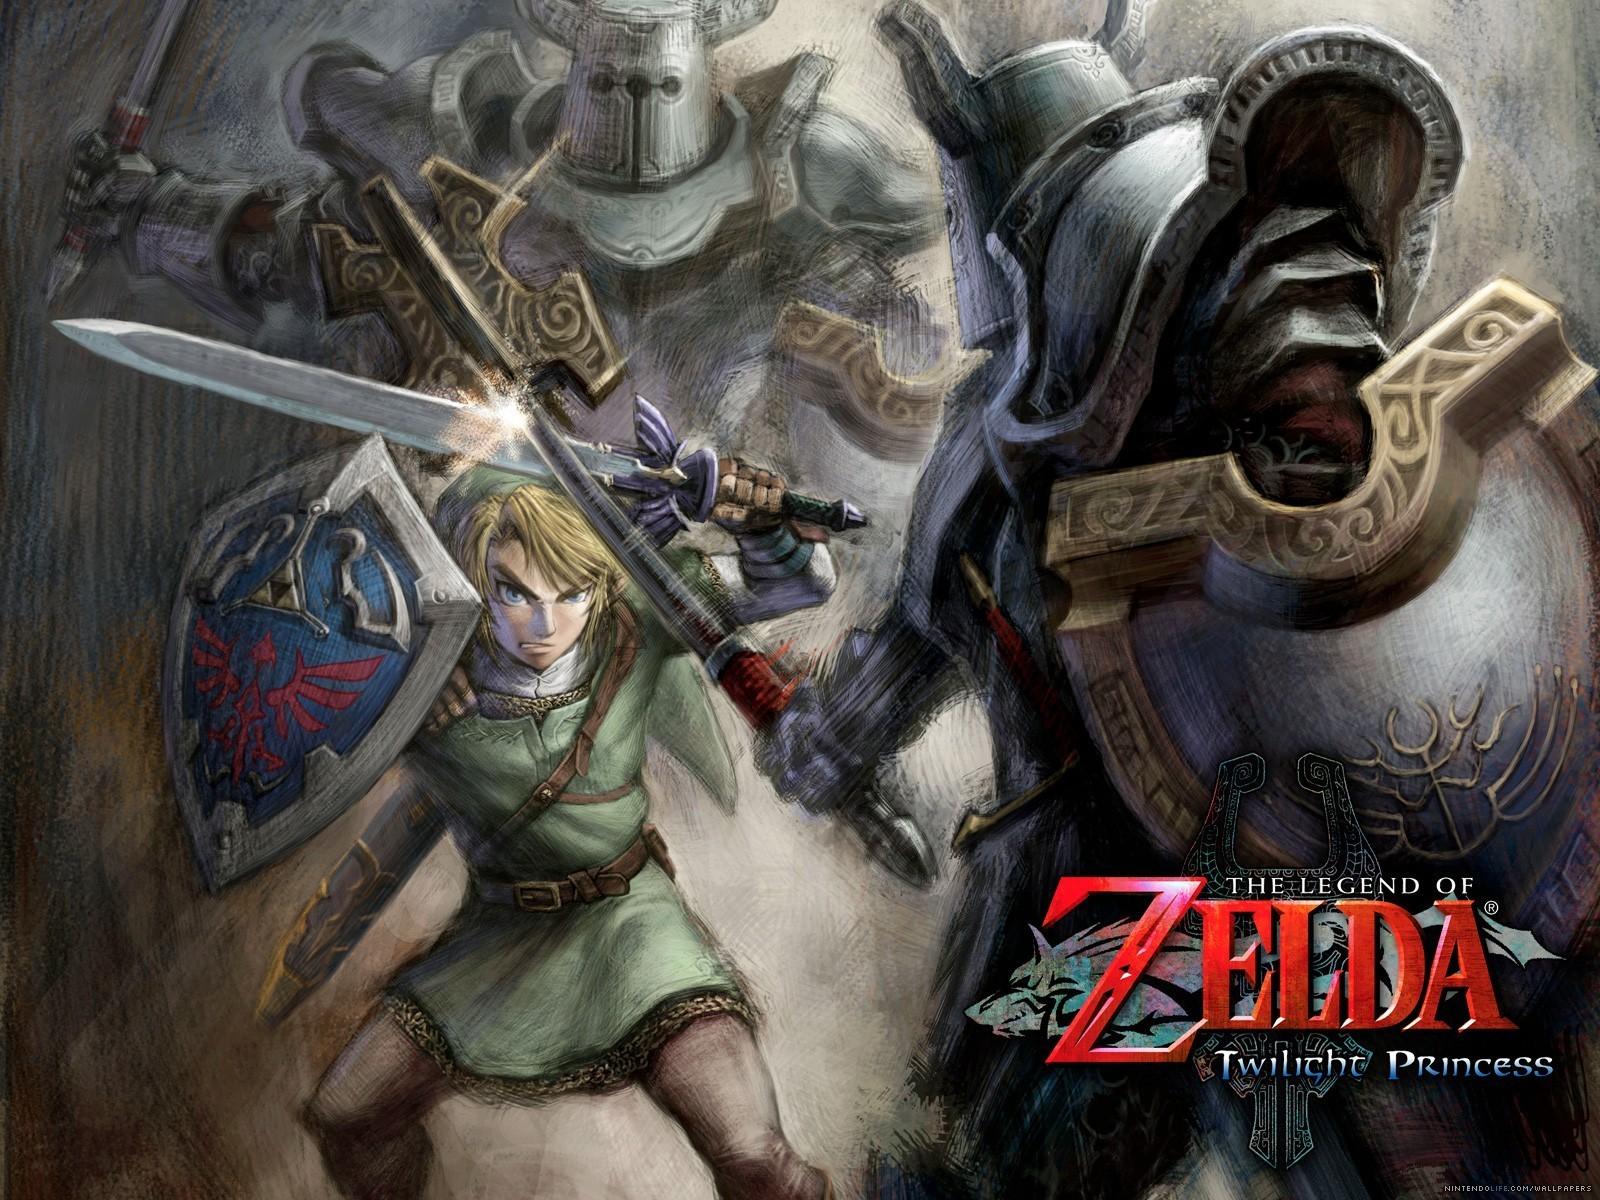 LEGEND OF ZELDA: Animated Movie